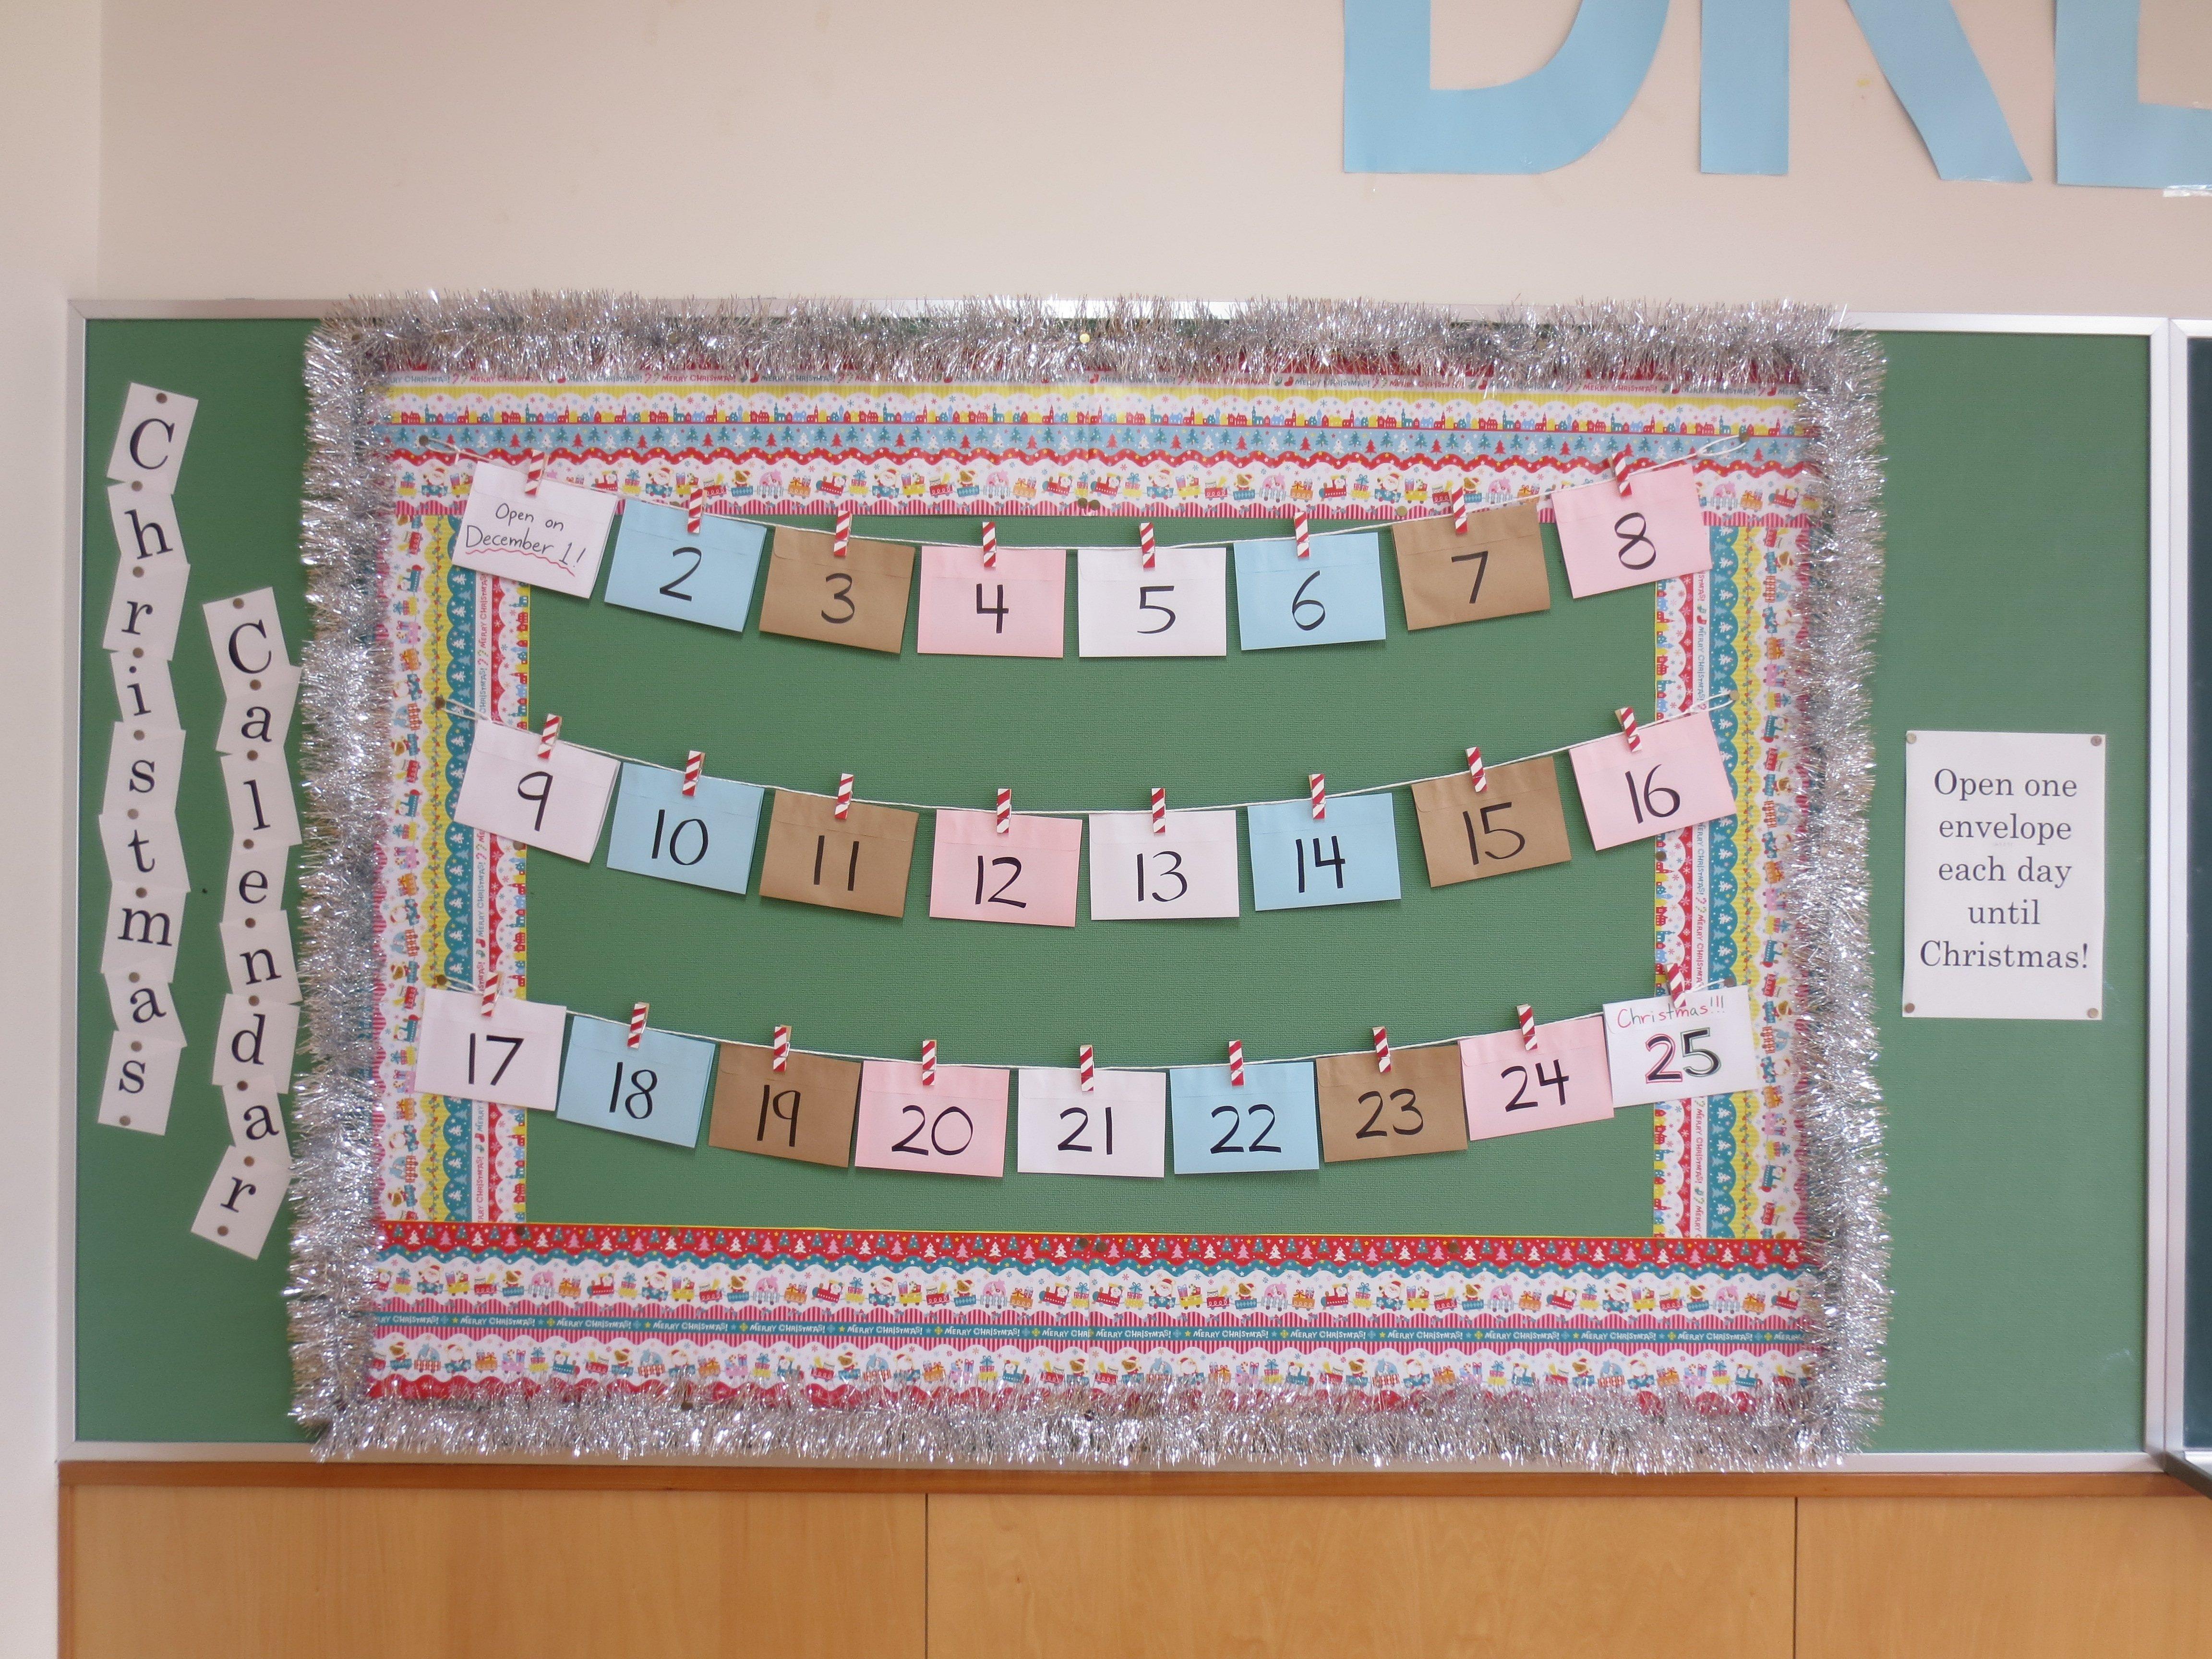 10 Lovable Christmas Bulletin Board Ideas For Teachers simple english bulletin board ideas e7b4a0e695b5e381aae383a9e382a4e38395 1 2020